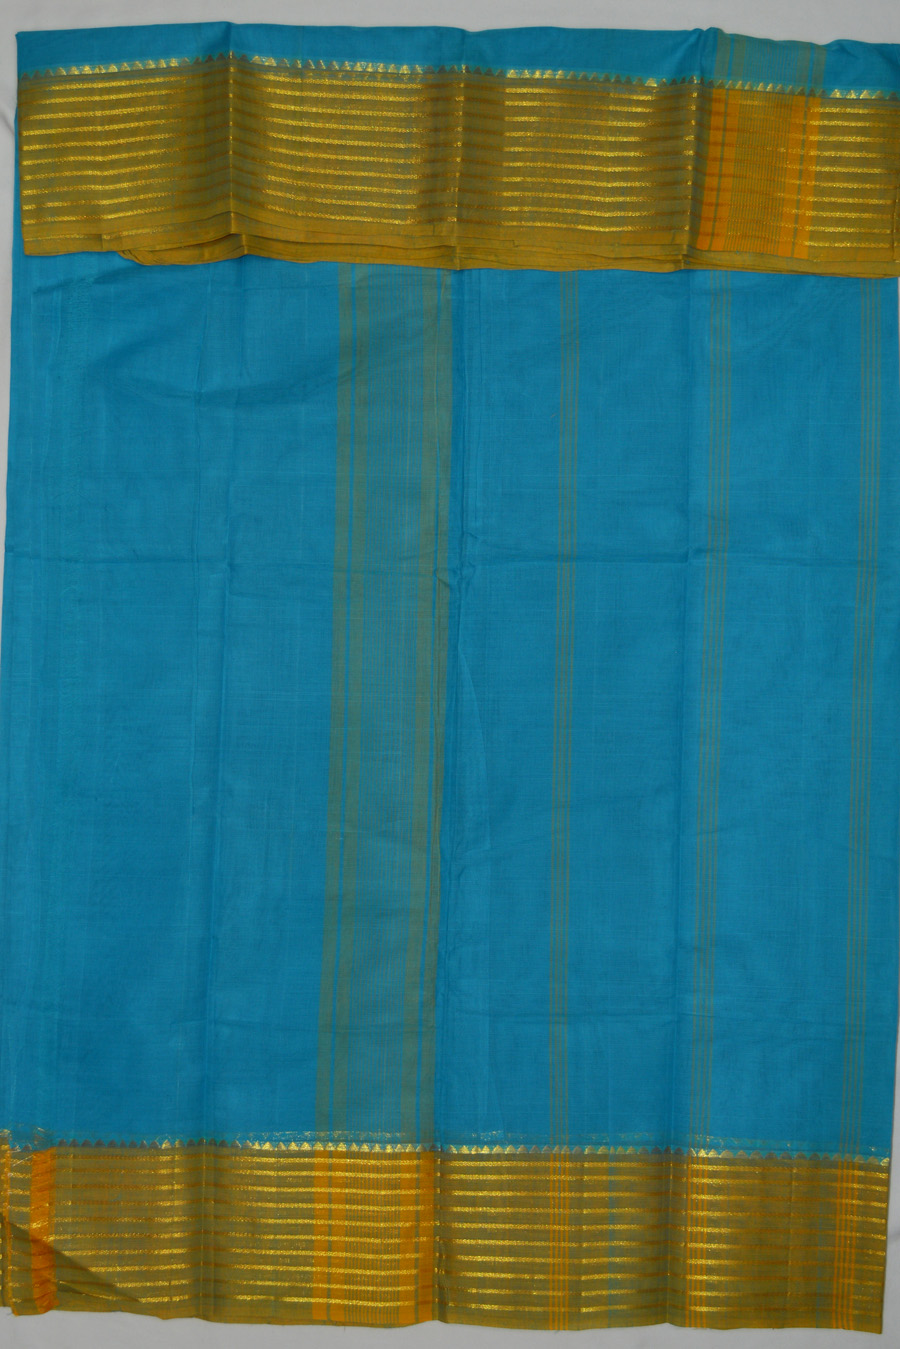 Kanchi Cotton 2743